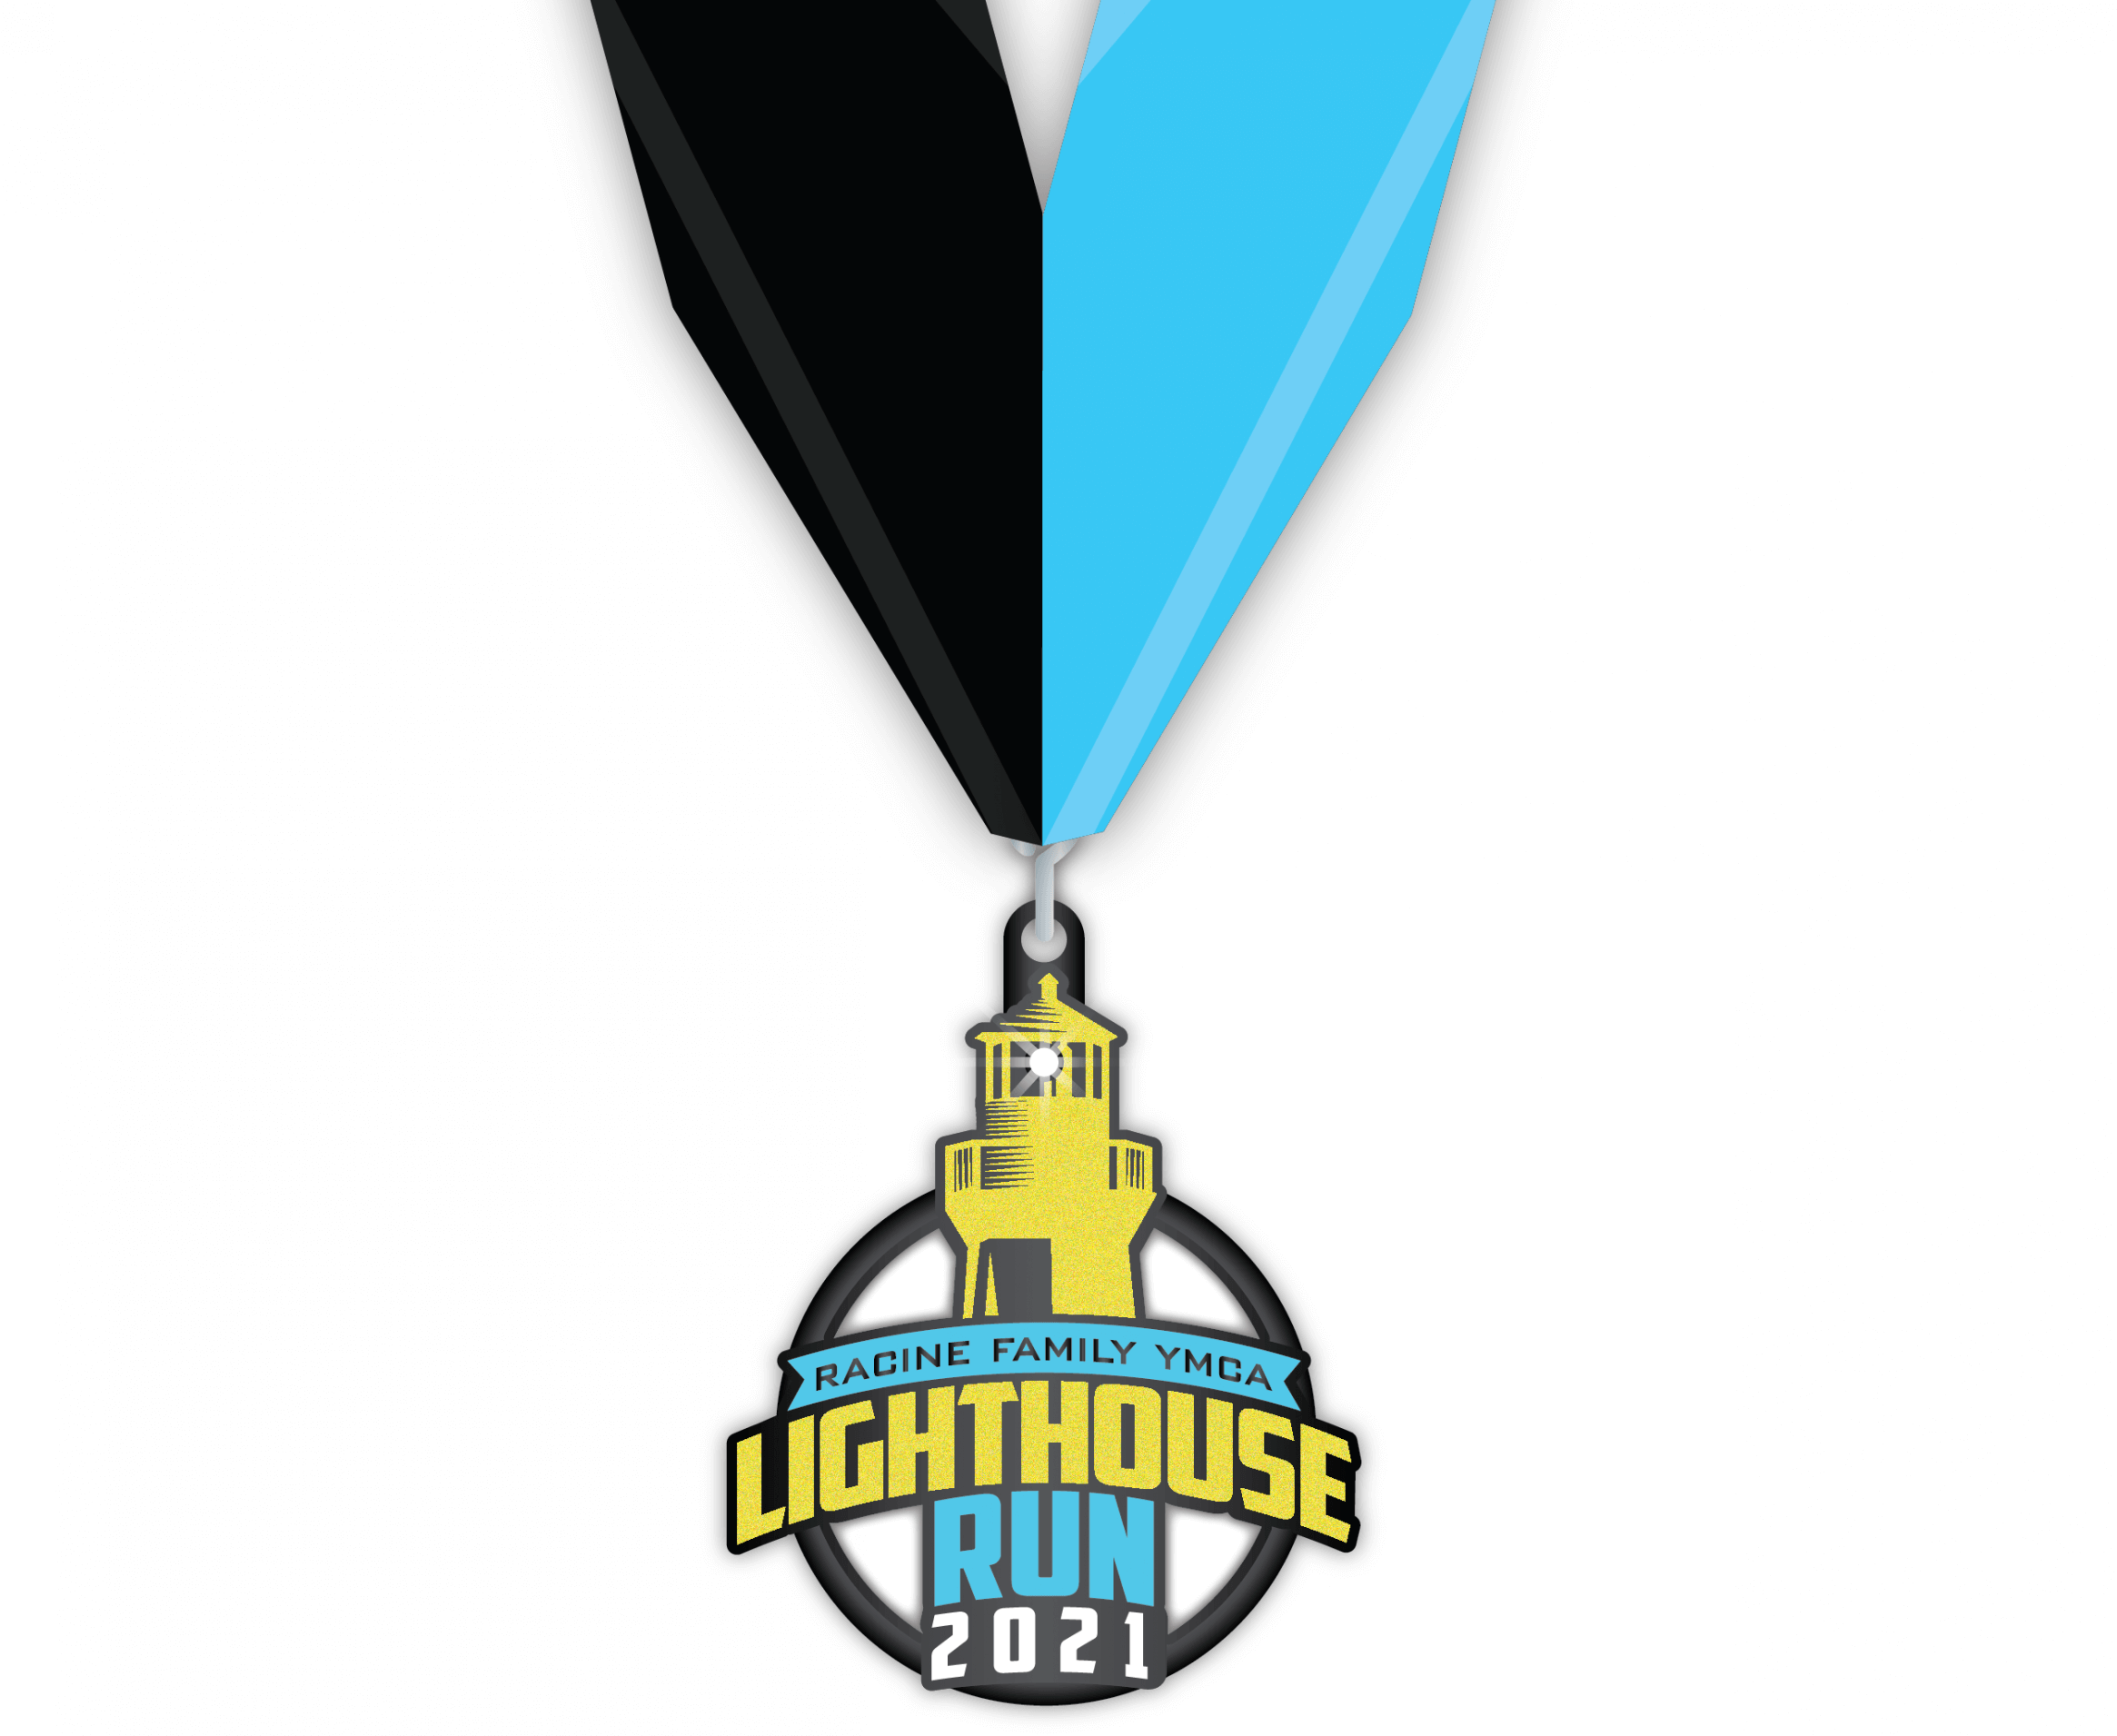 Lighthouse Run 2021 Finishers Medal